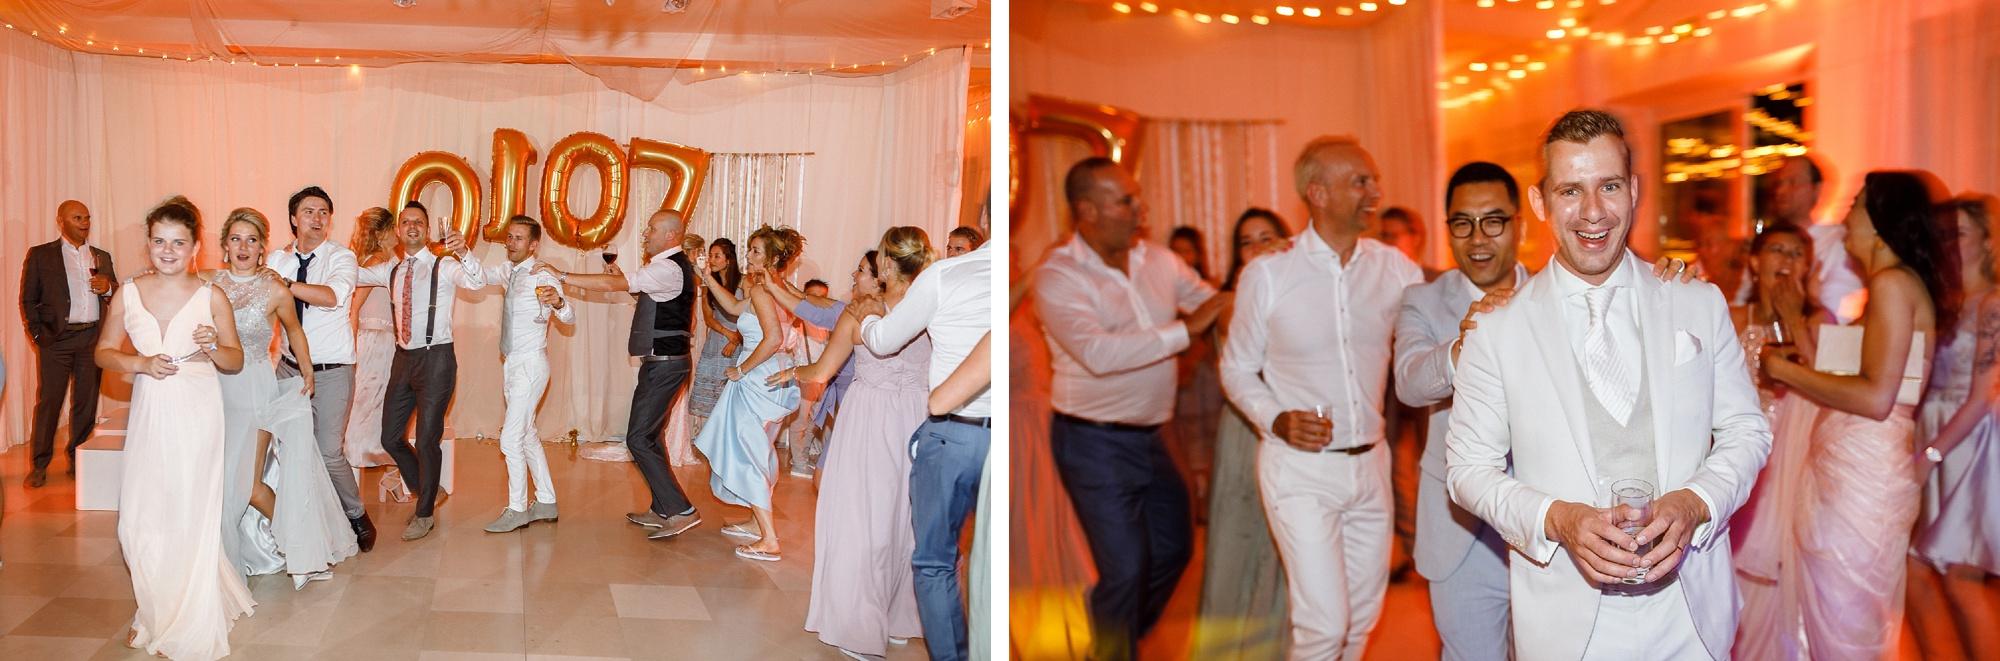 Wedding-Chateau-de-Varennes-084.jpg